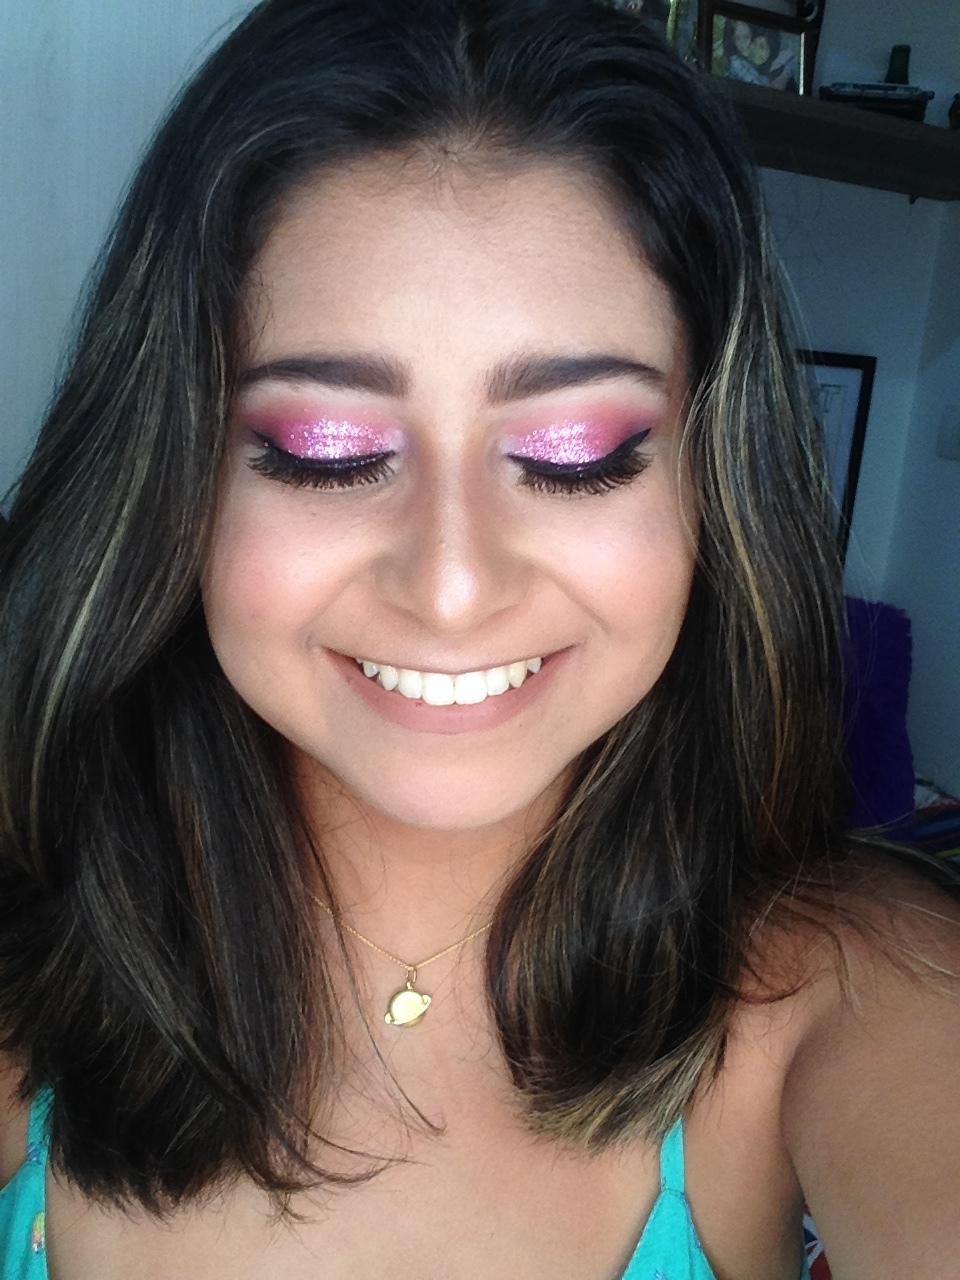 Maquiagem com glitter rosa maquiagem maquiador(a)